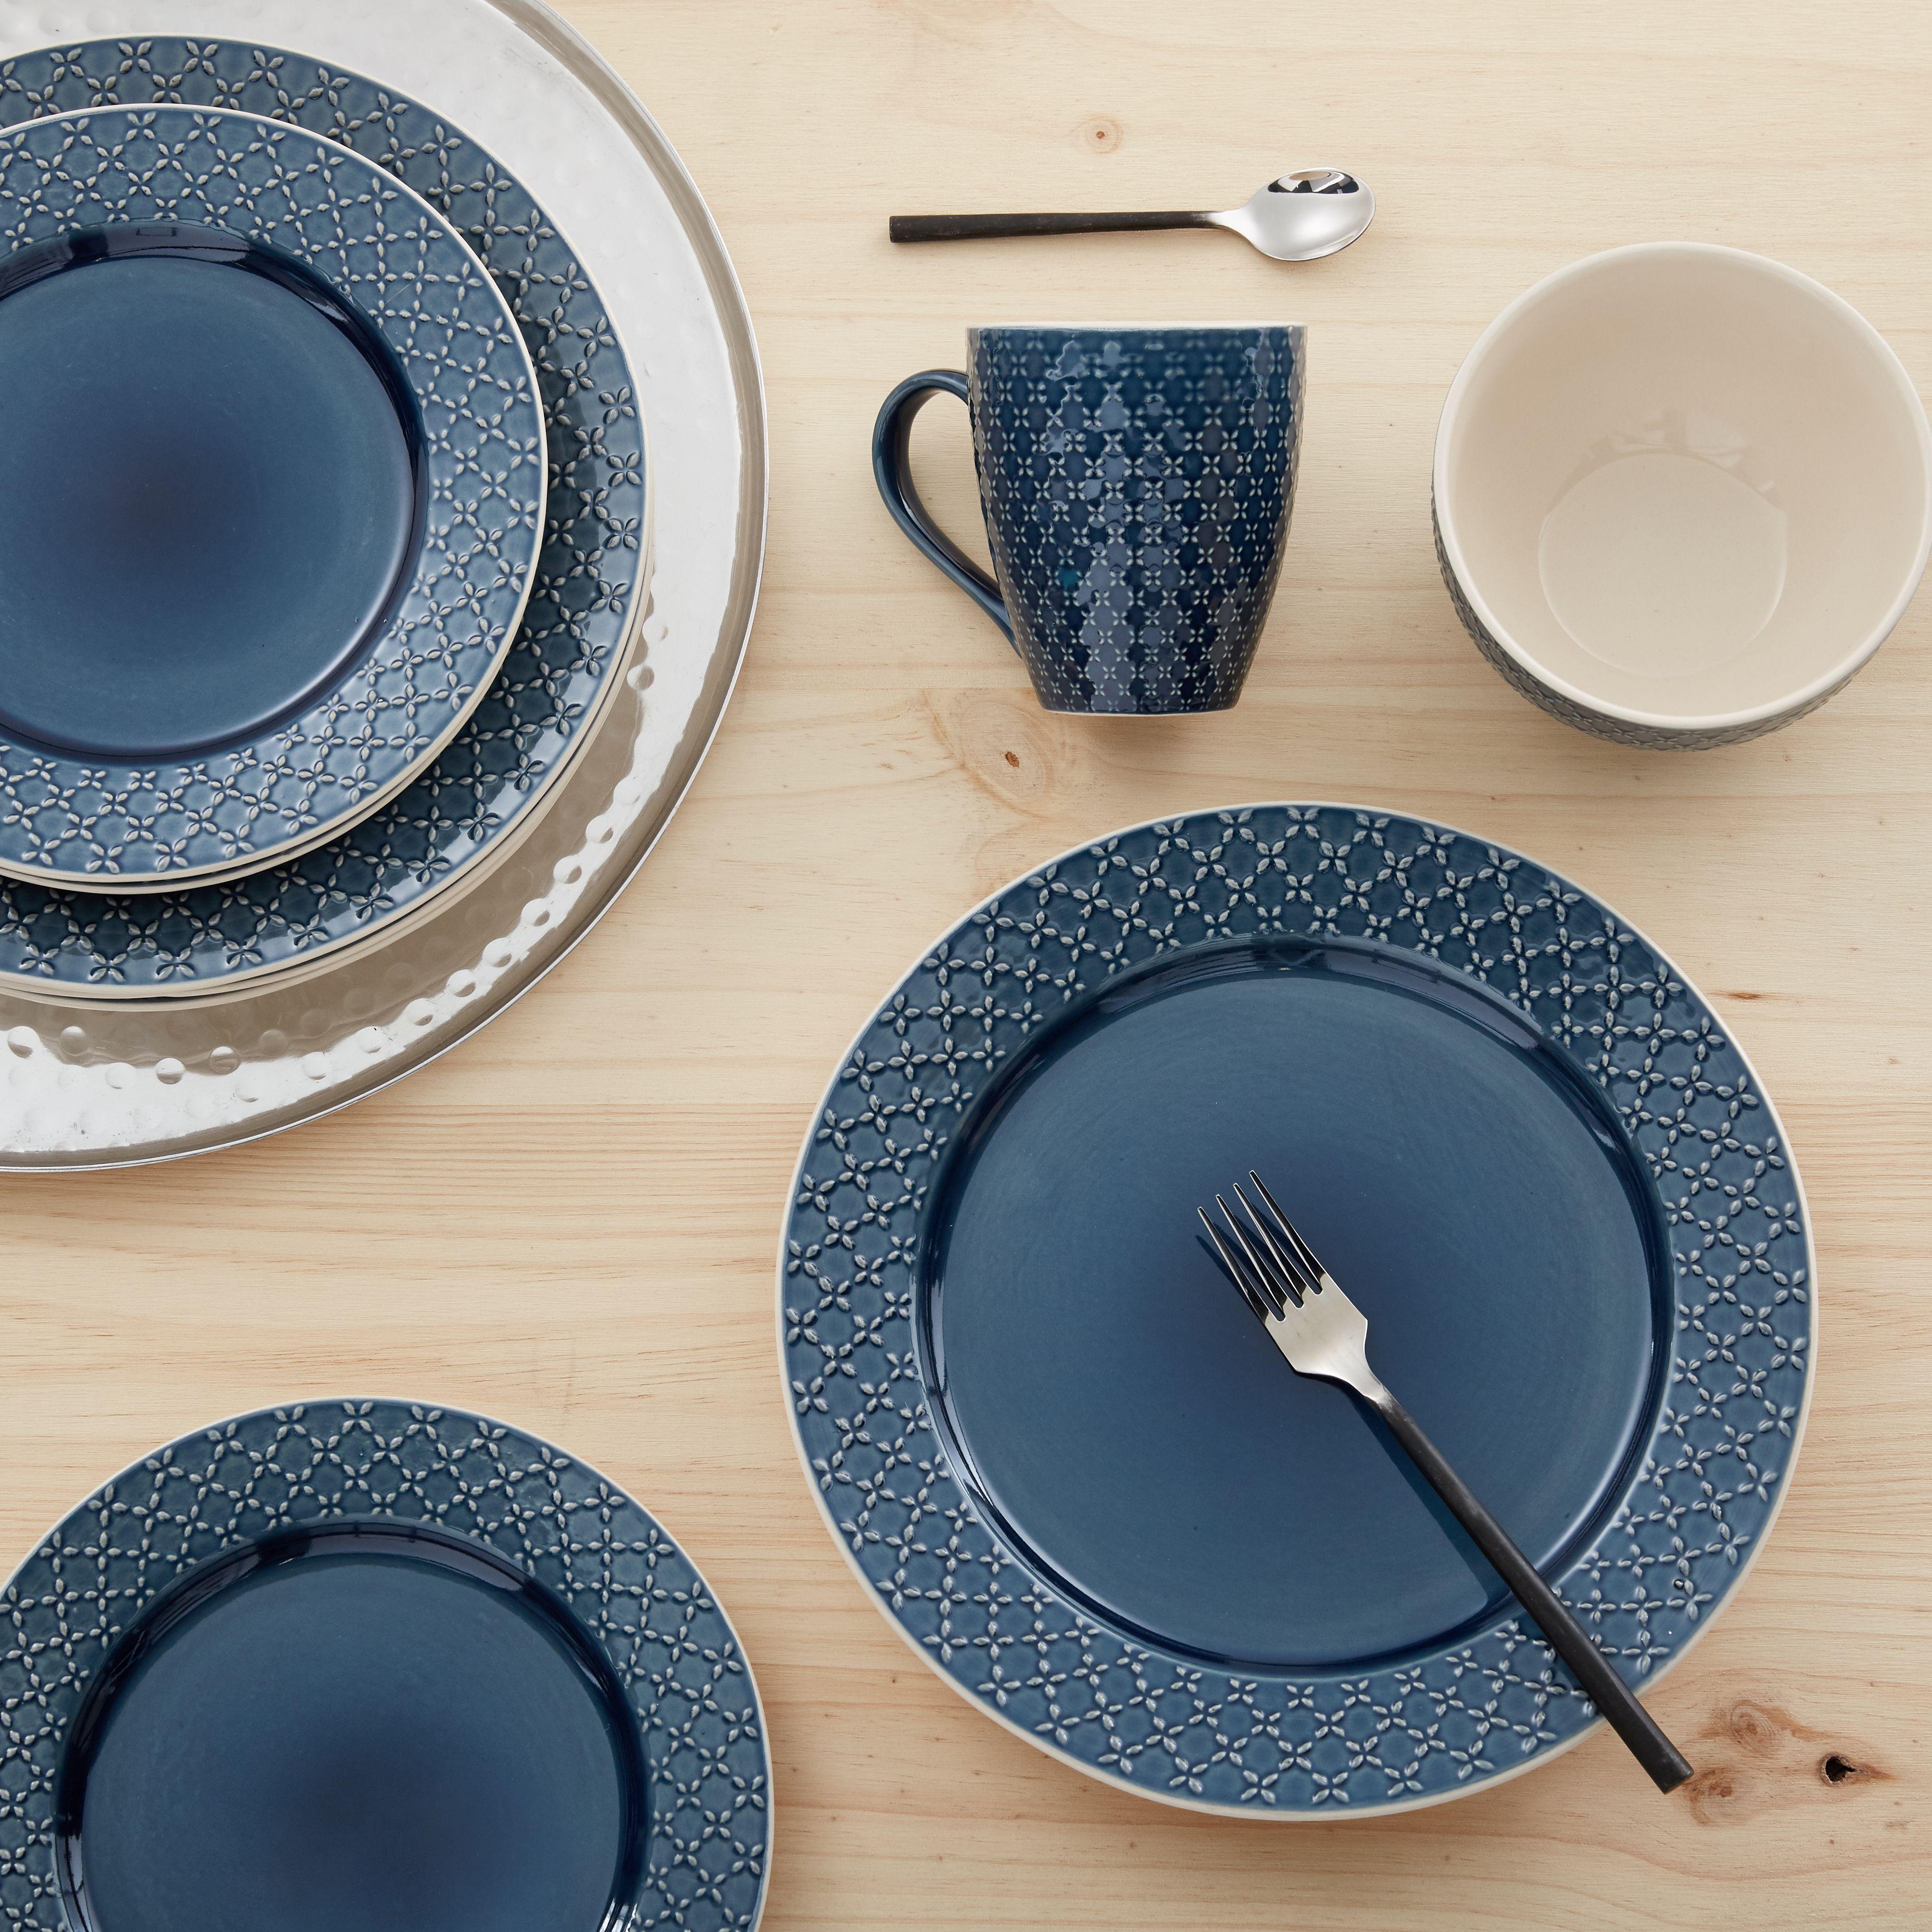 Jasmine Assiette Dessert En Gr S Bleu Tendance Boh Me D20cm  # Rangements Assietes Modernes